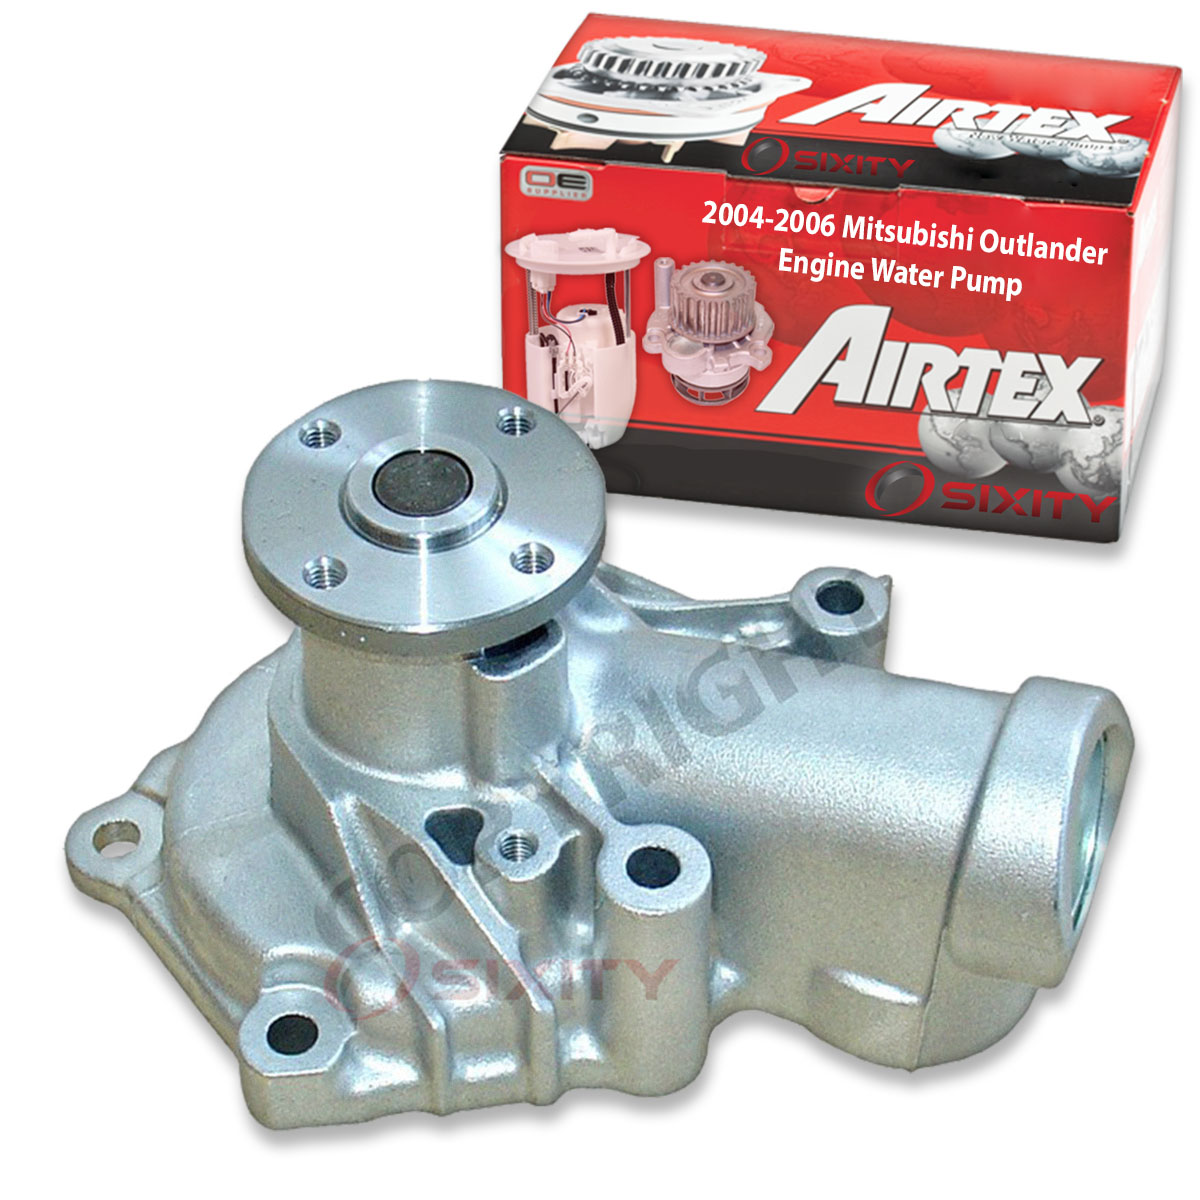 Coolant sf Gates Engine Water Pump for 2004-2006 Mitsubishi Outlander 2.4L L4